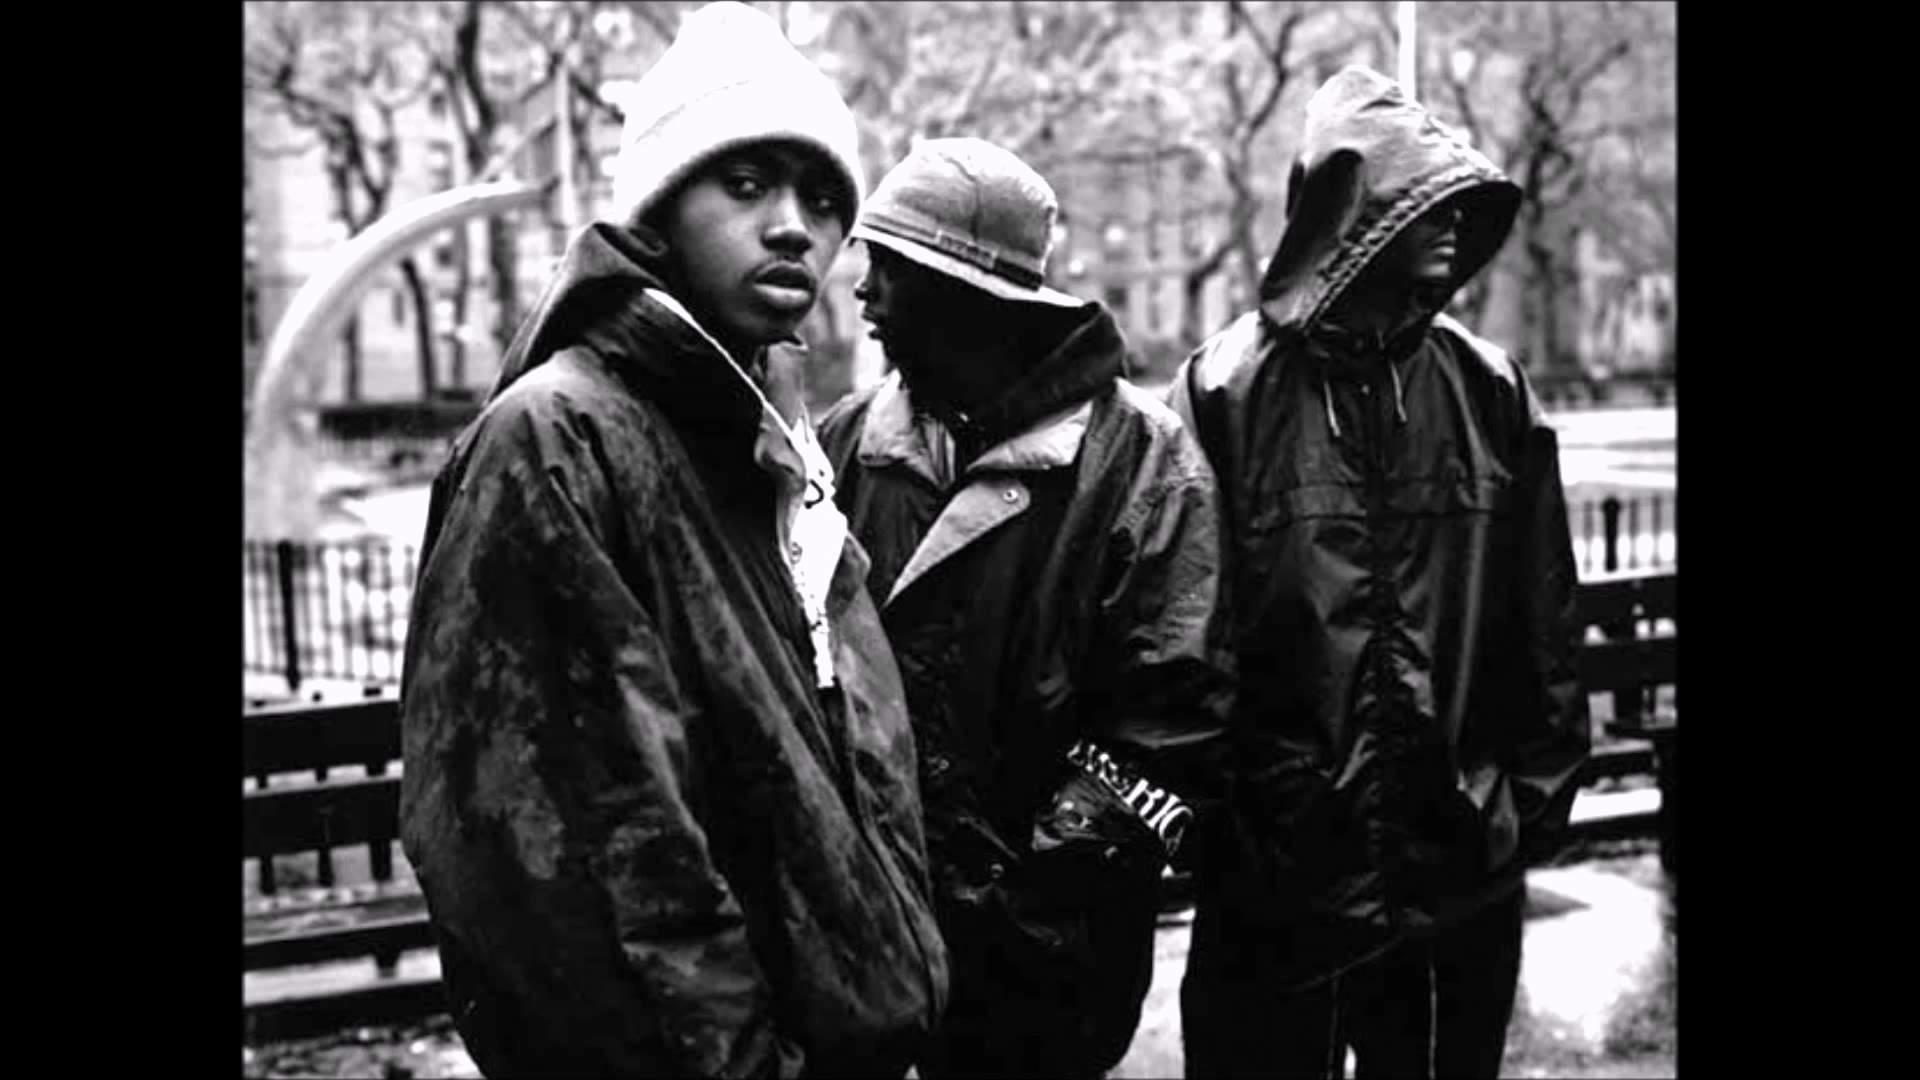 *New* 2015 Old School Rap Instrumental Type Beat W/ Nas Vocal Samples